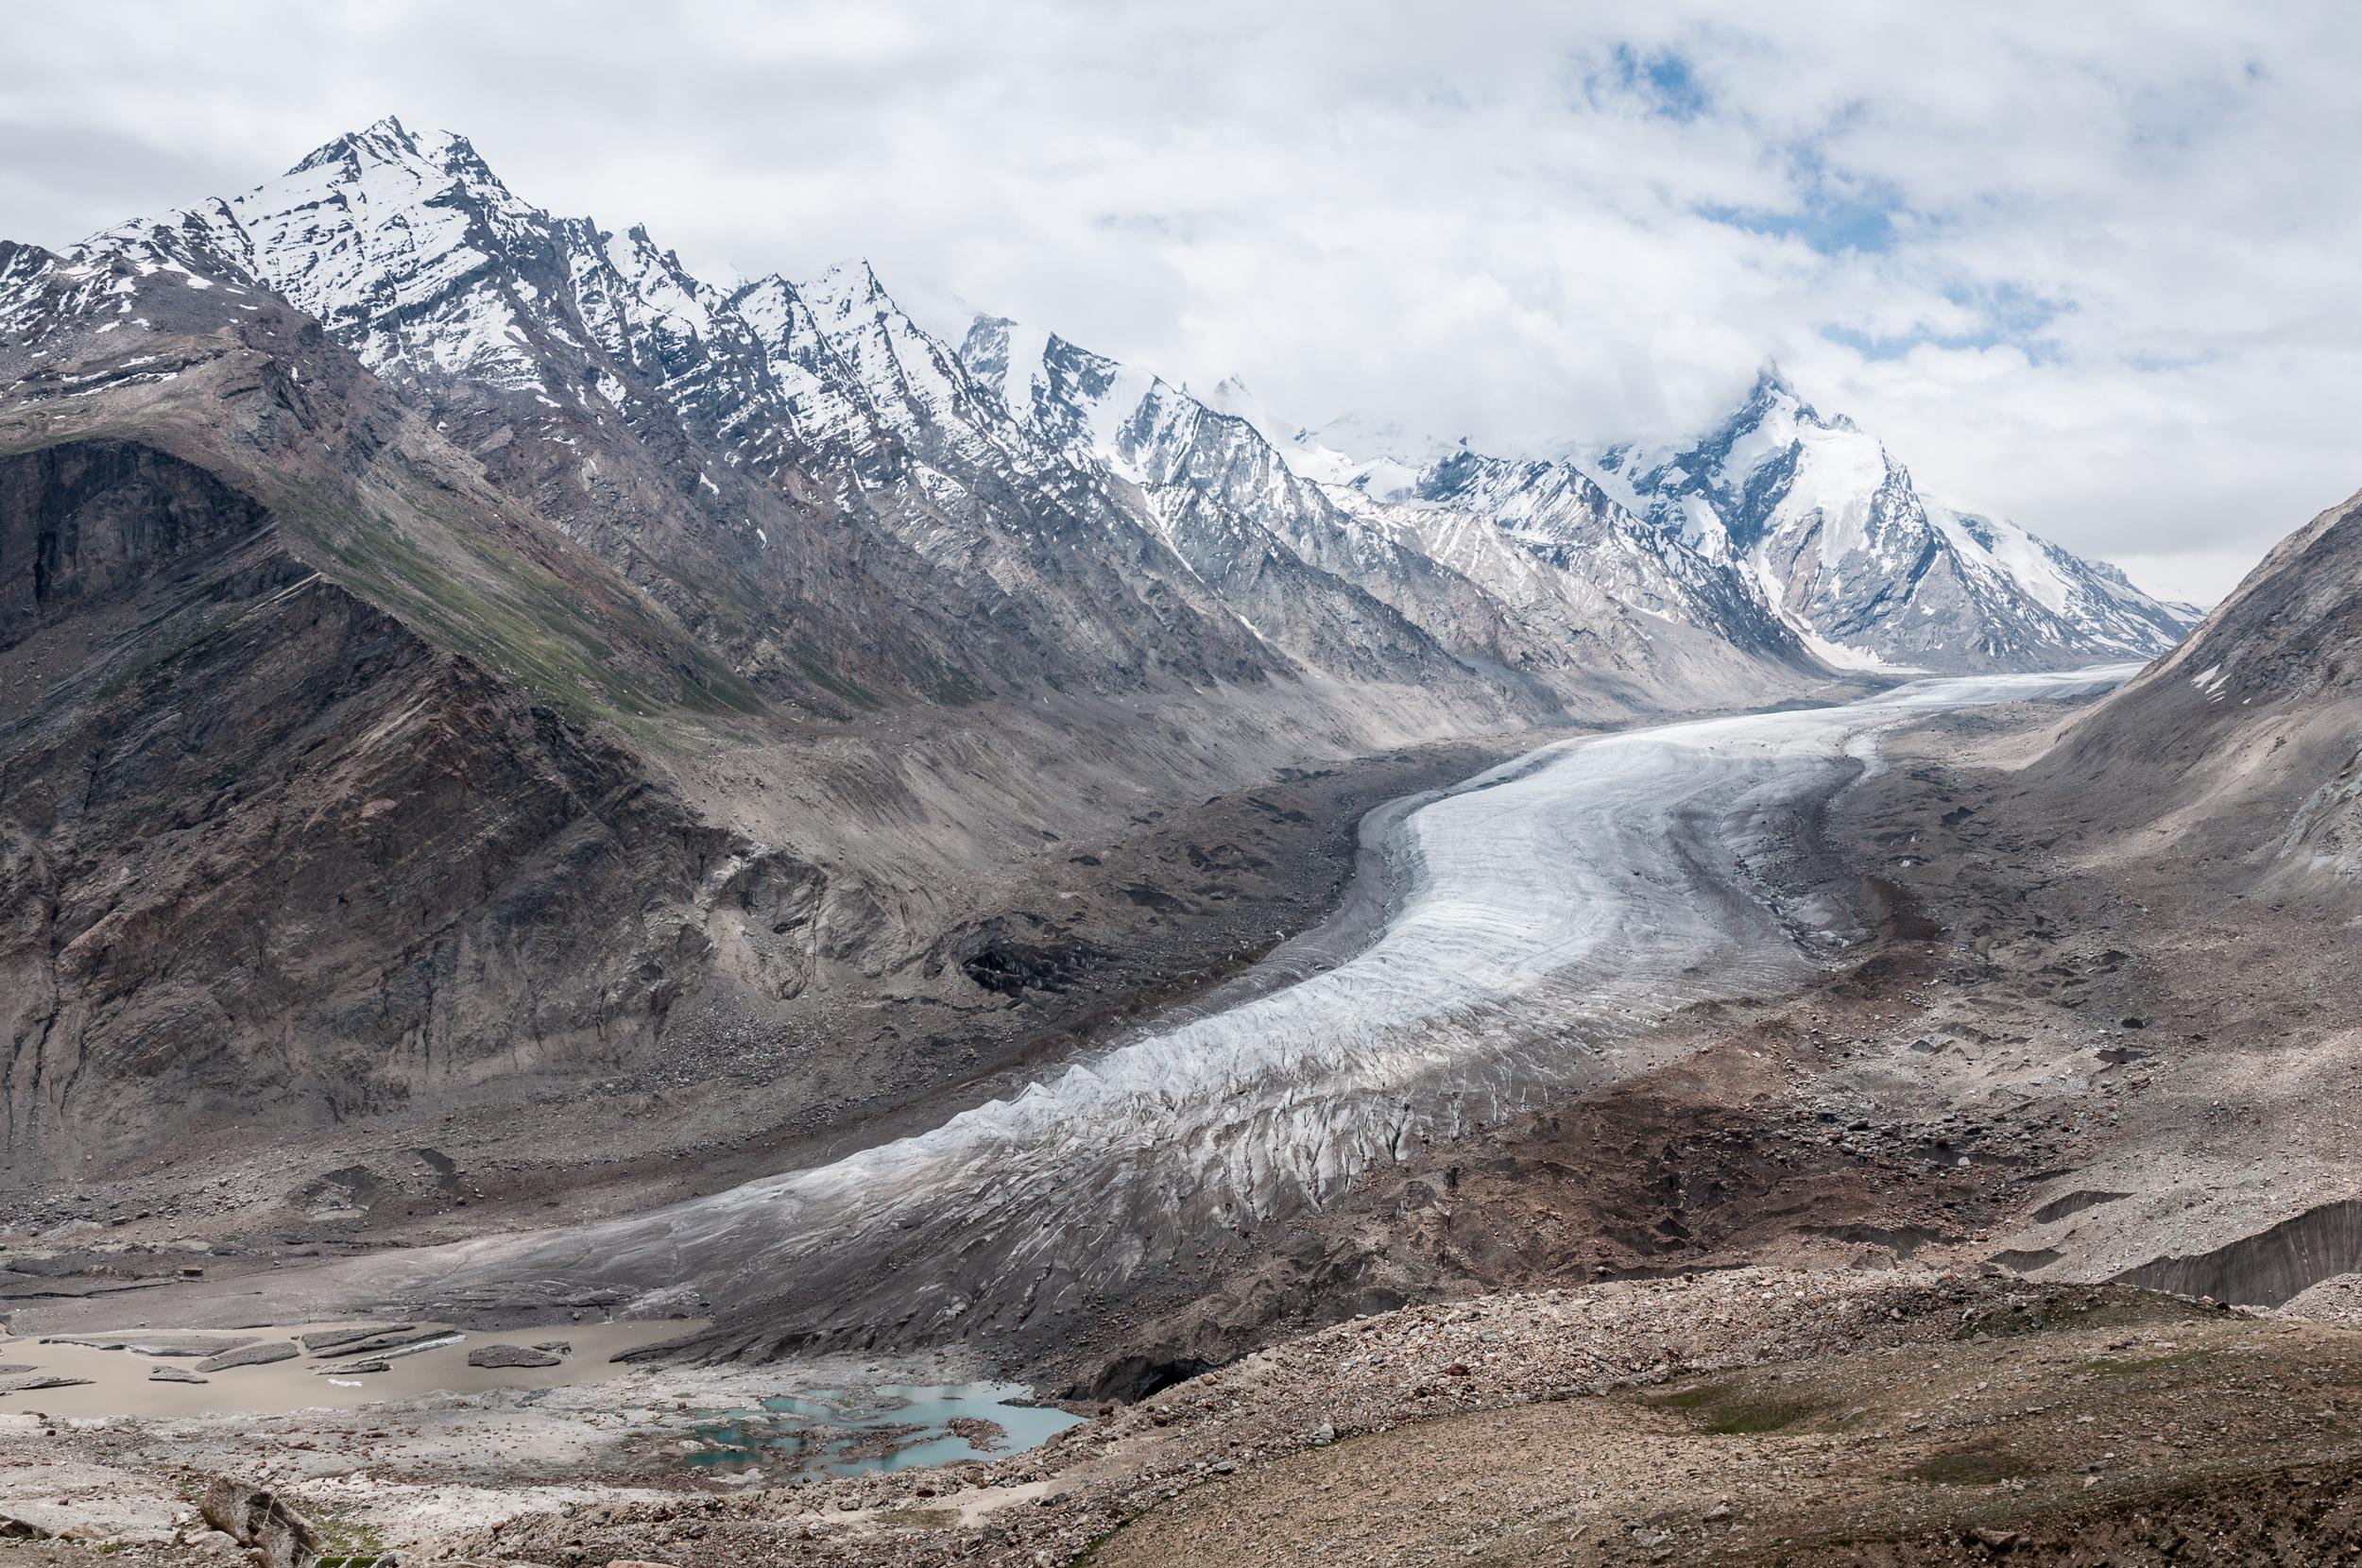 Drang_Drung_glacier_seen_from_Pensi_La_p